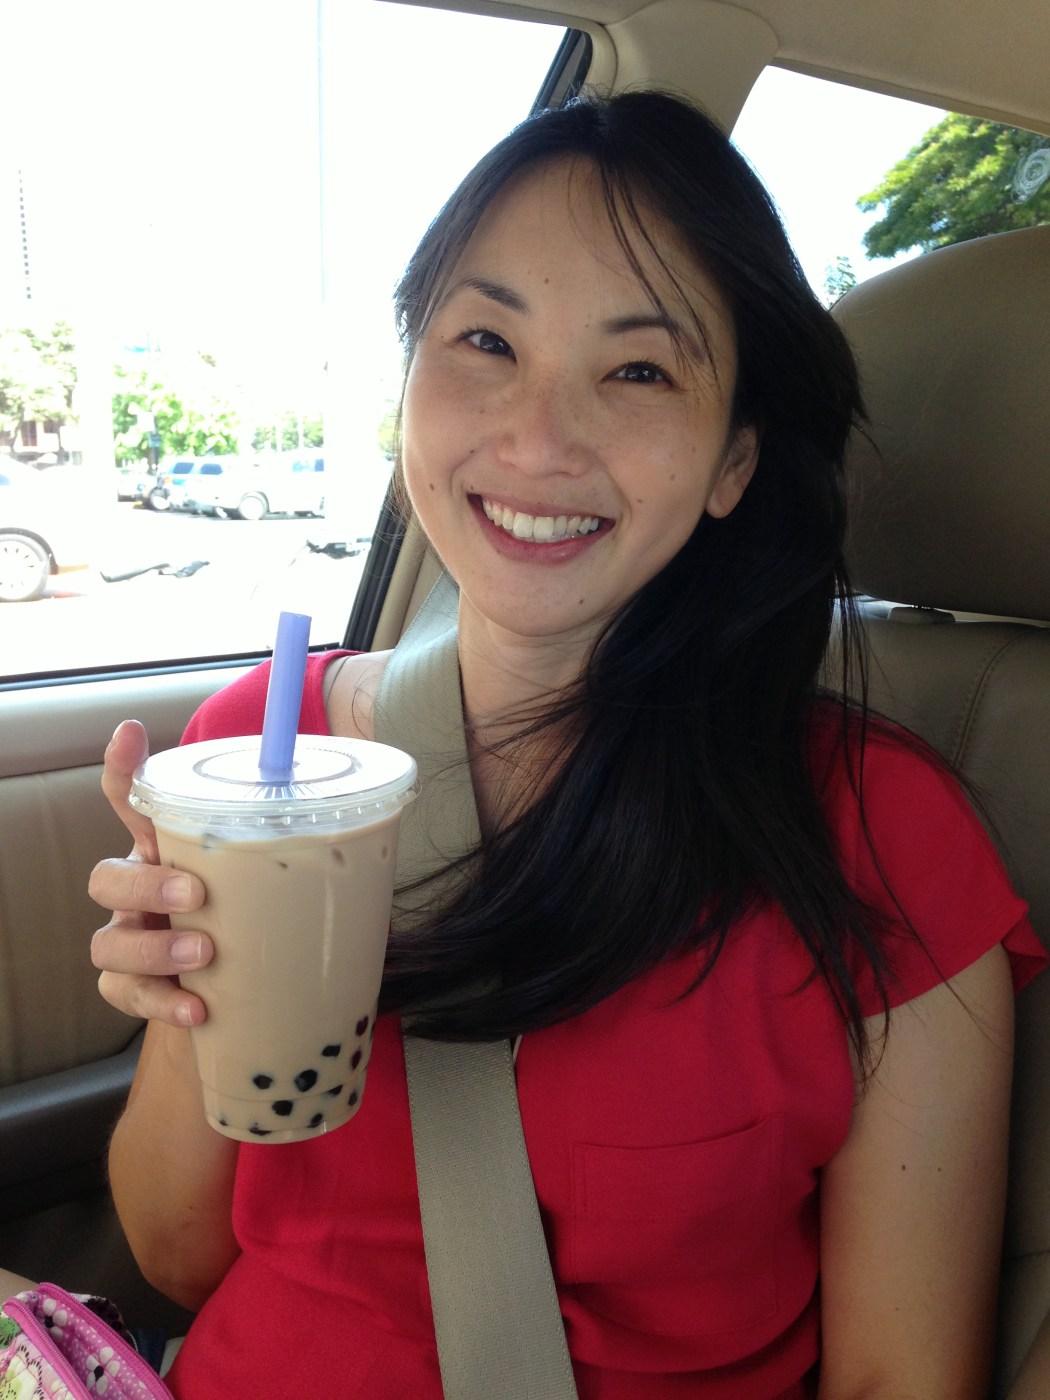 Bubble Tea Mania - The Hunt for Hawaii's Best Bubble Tea - Part I